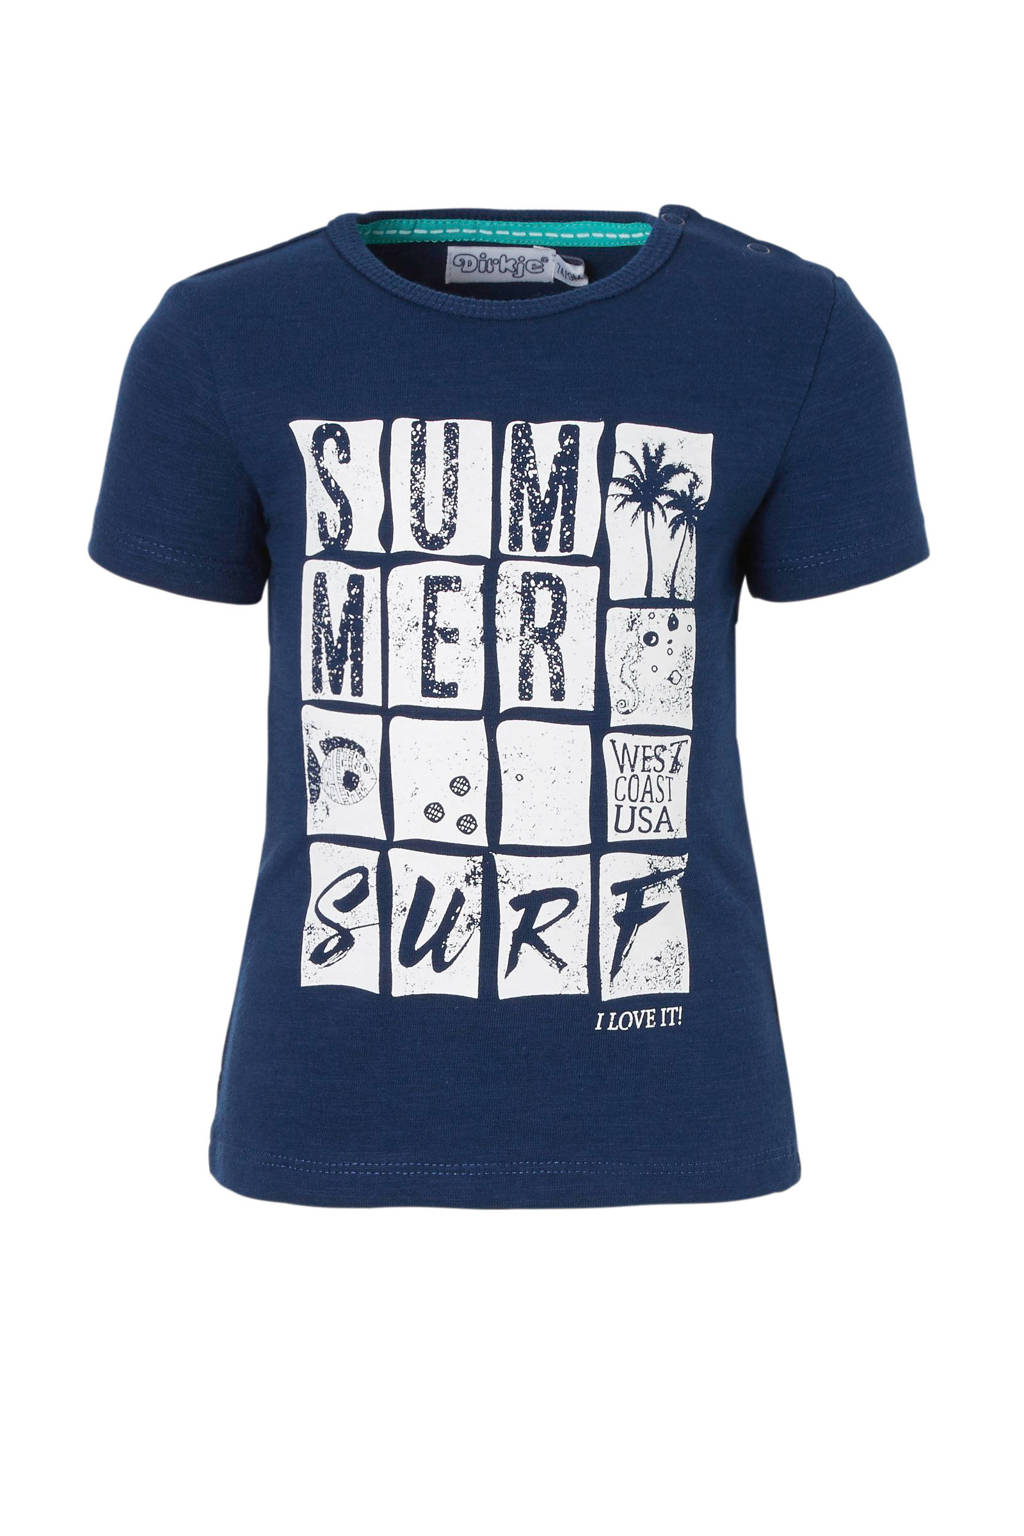 Dirkje T-shirt met print donkerblauw, Donkerblauw